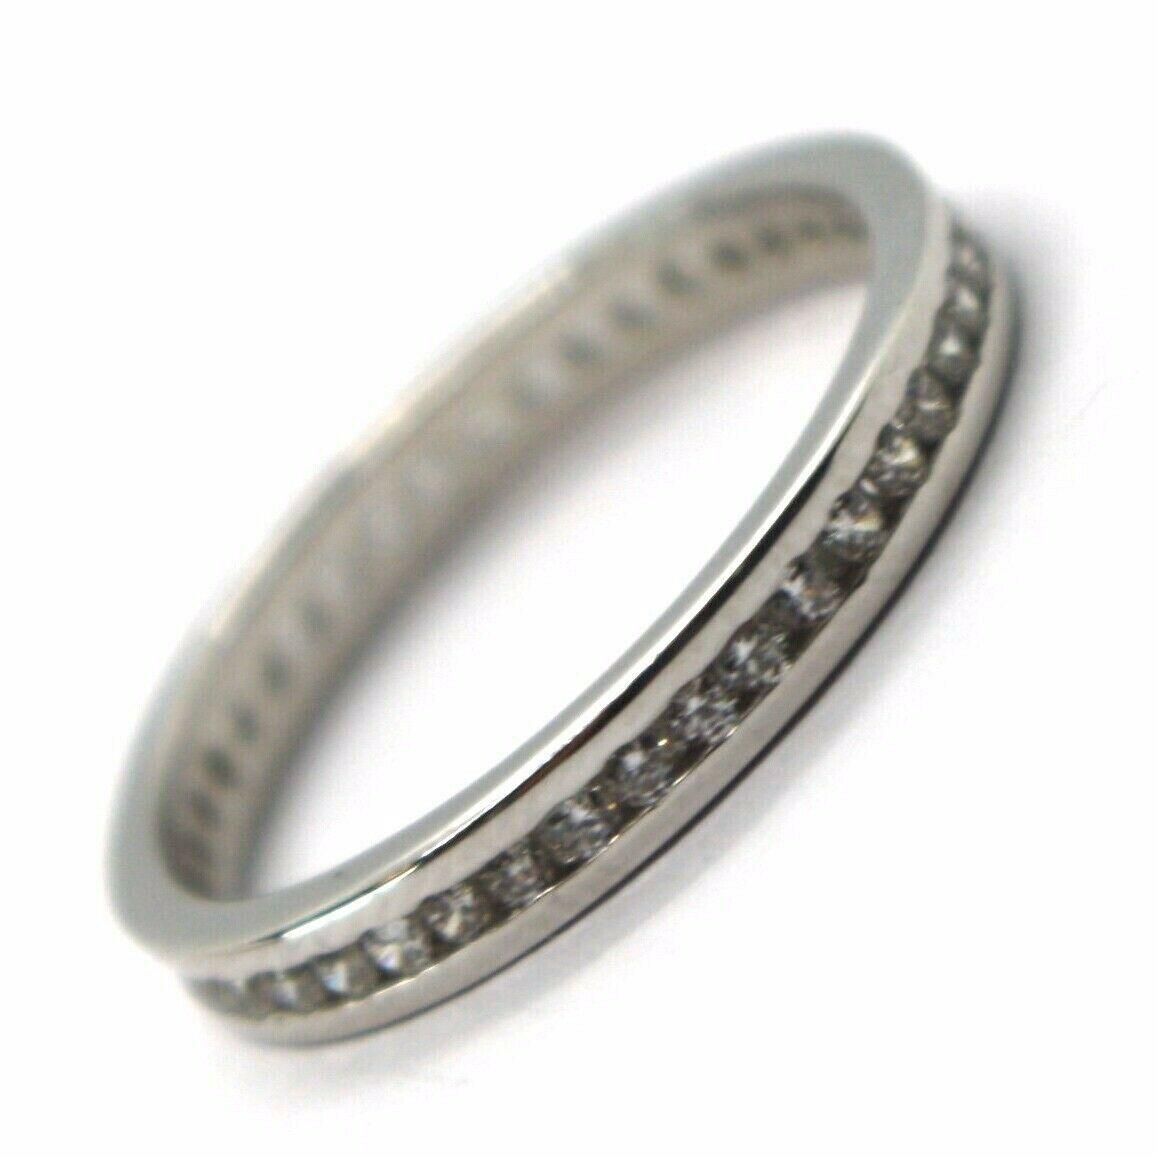 Ring Weißgold 750 18K, Eternity Binär , Dicke 3 mm, Zirkonia Kubische